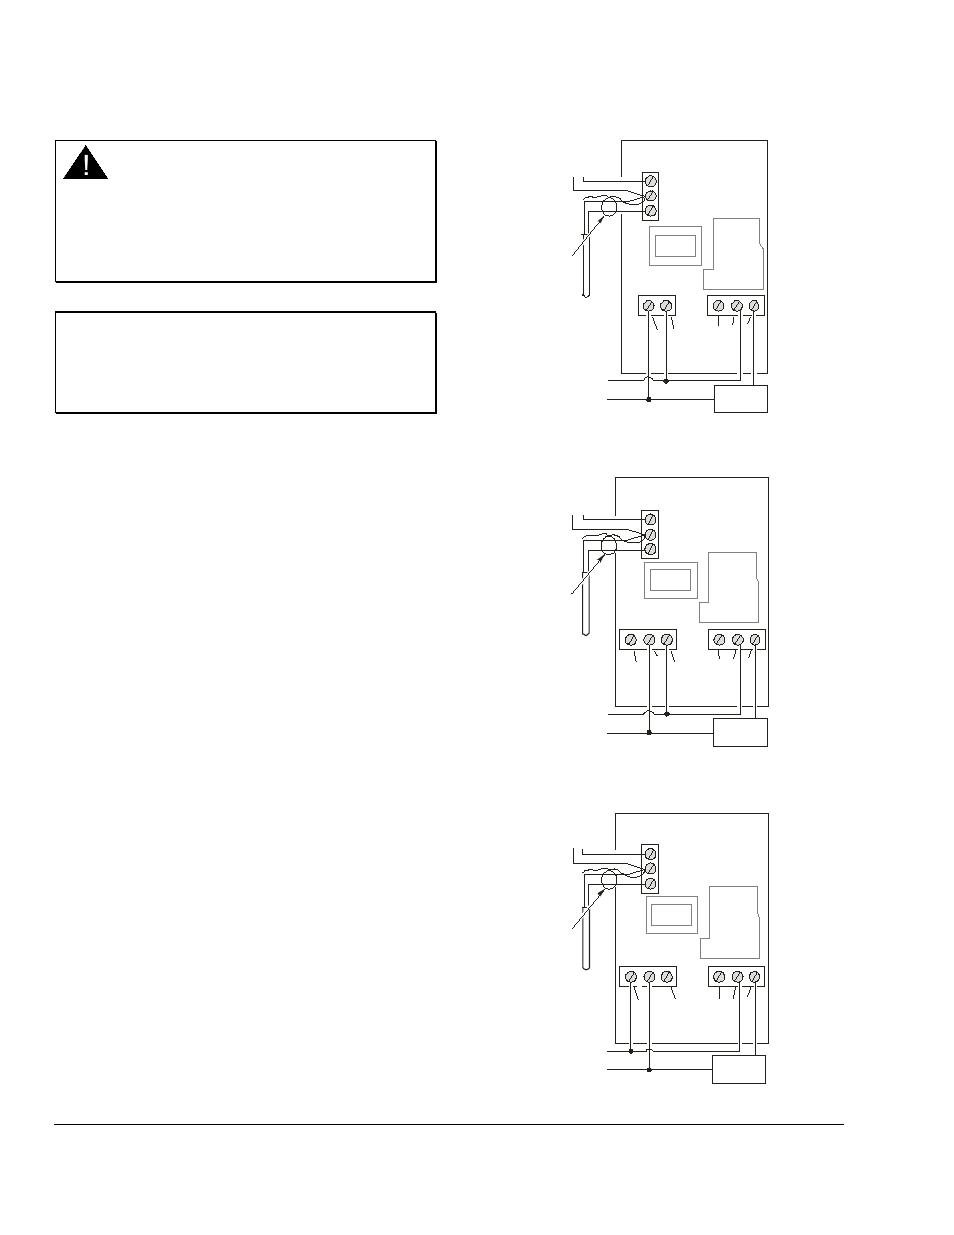 Johnson Controls A419 Wiring Diagram